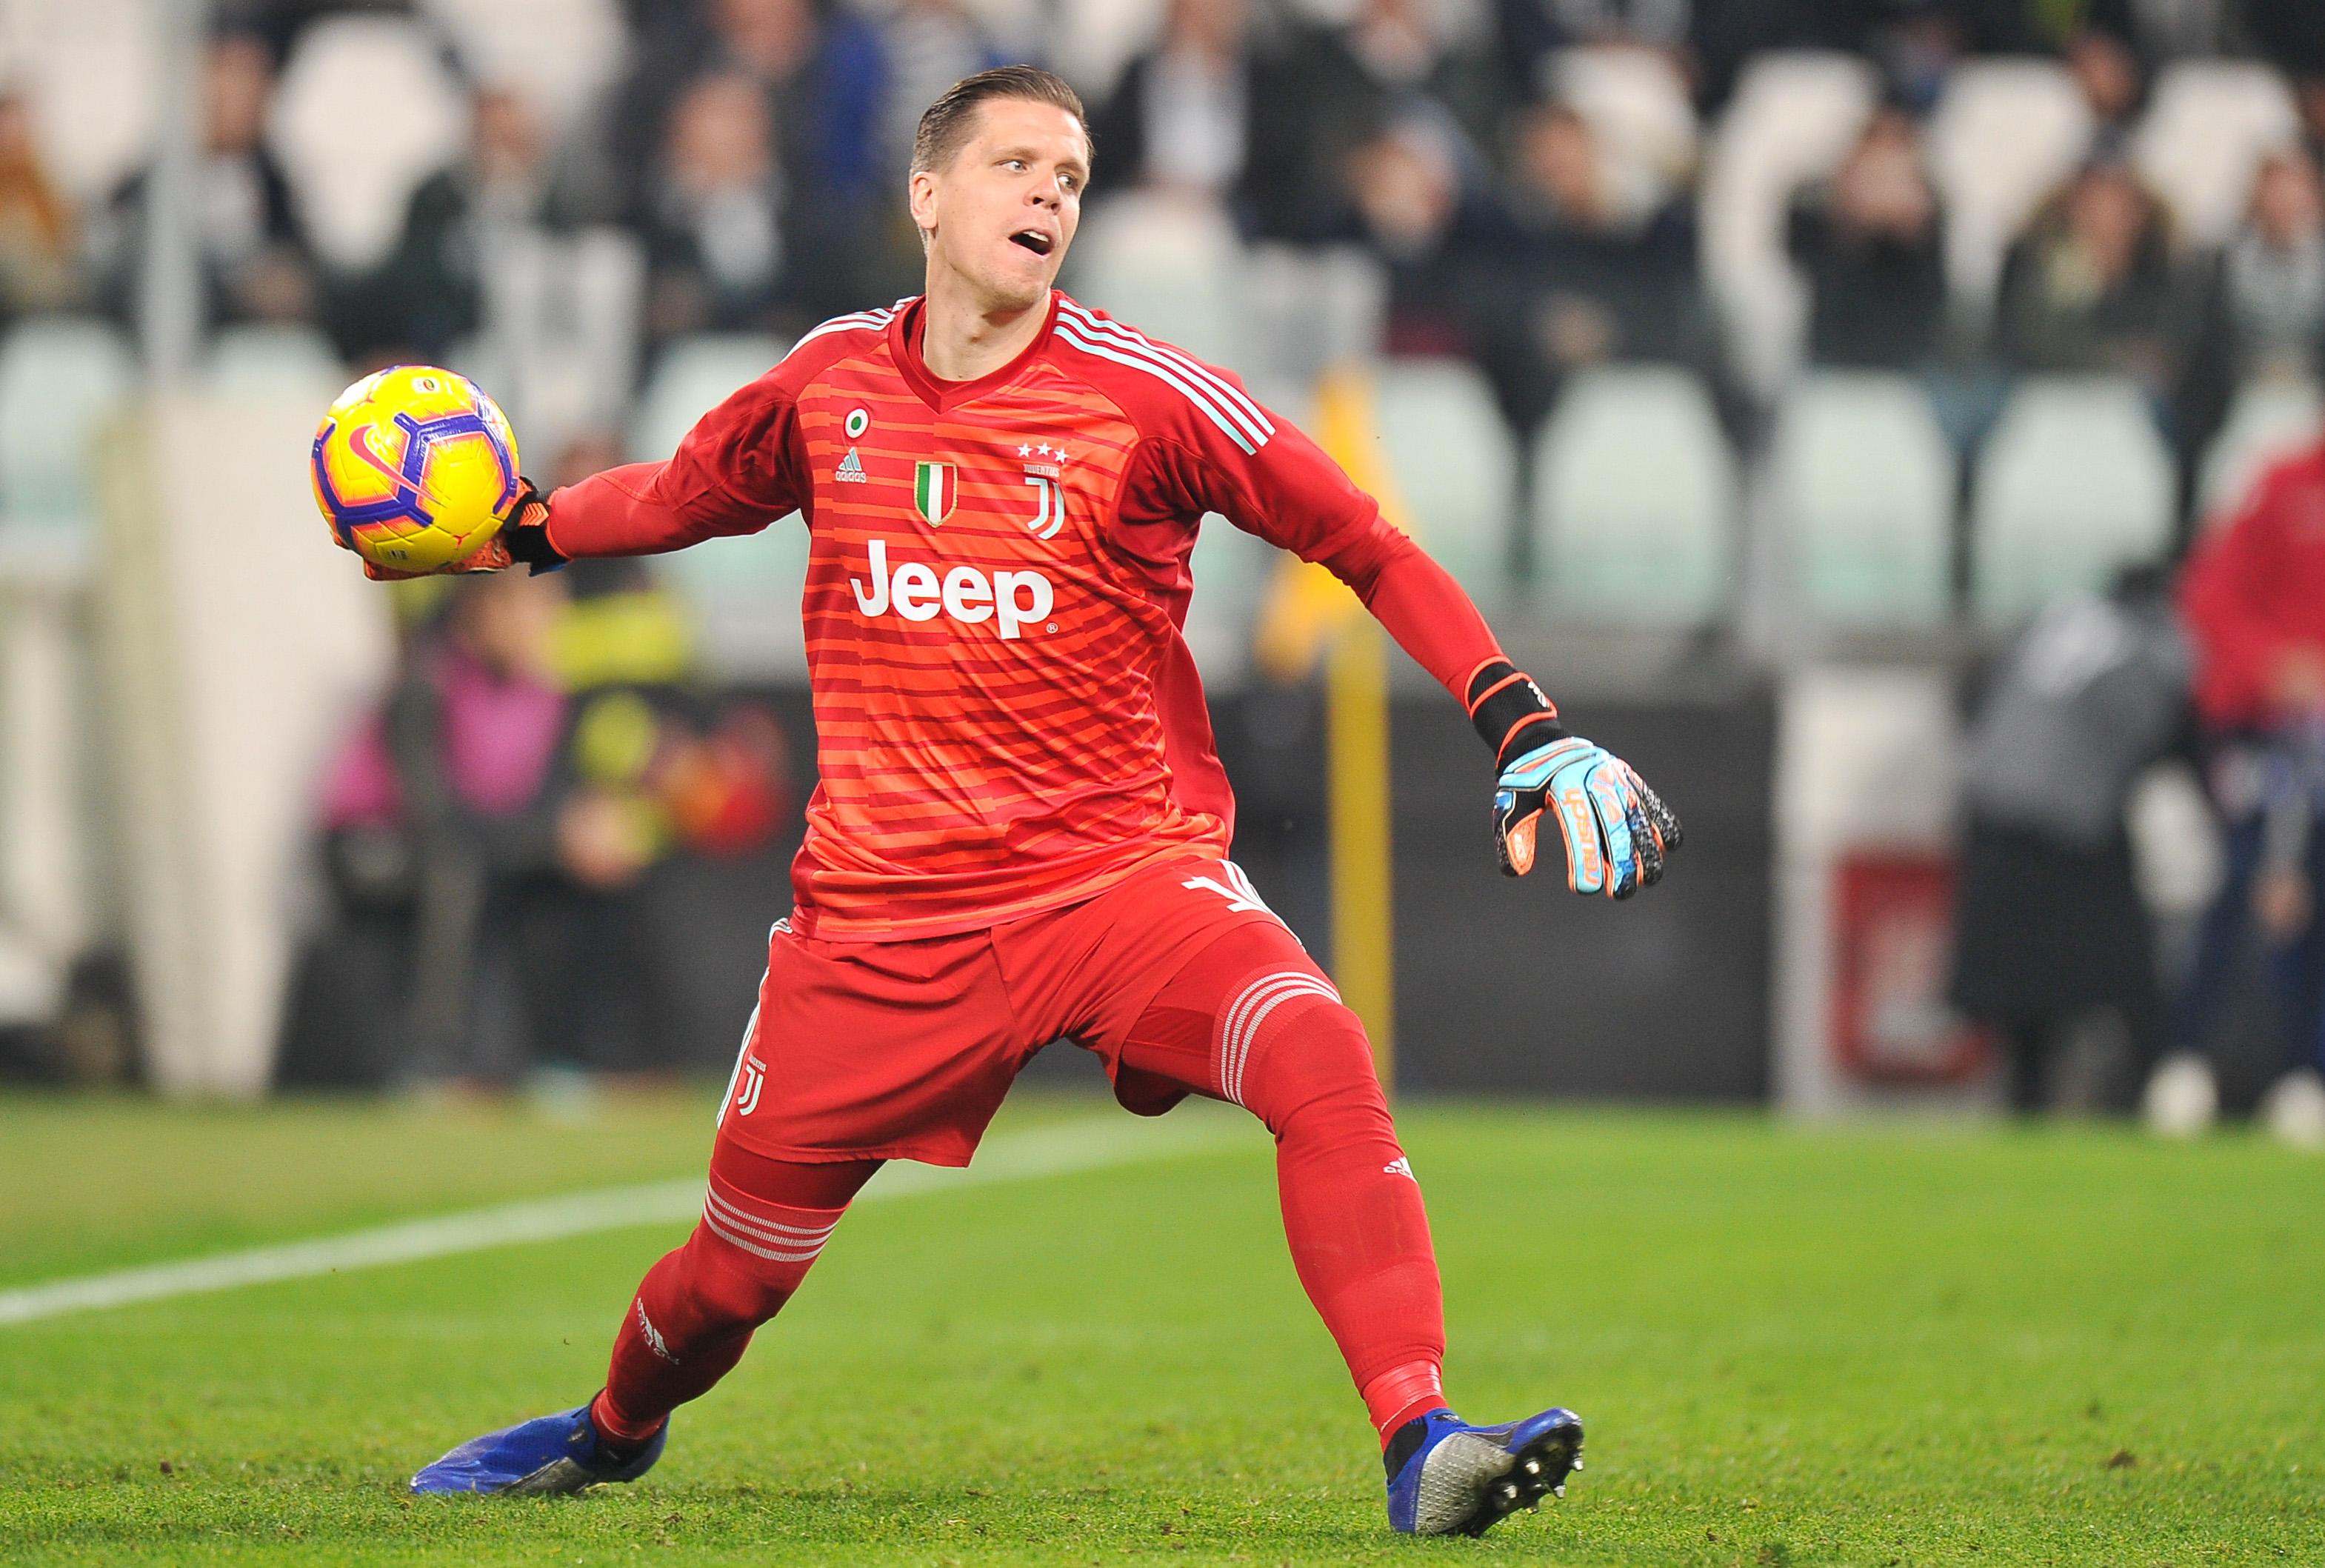 2018.11.03, Turyn, Pilka nozn, Seria A 2018/2019, Juventus Turyn - Cagliari Calcio N/z: Wojciech Szczesny, Foto Norbert Barczyk / Press Focus